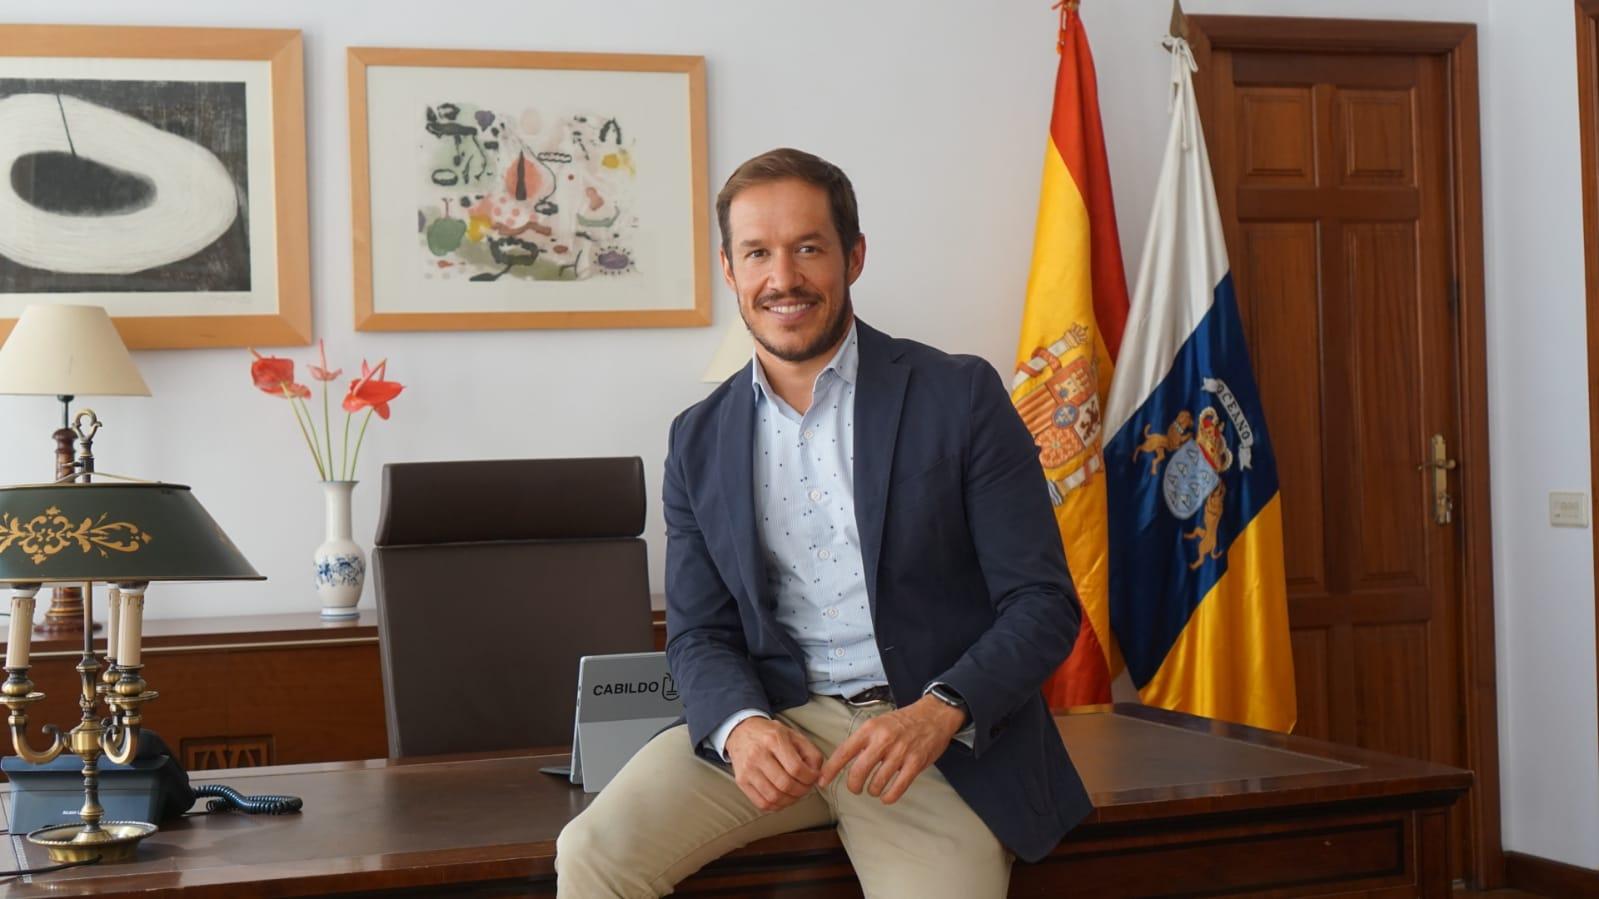 Mariano Zapata